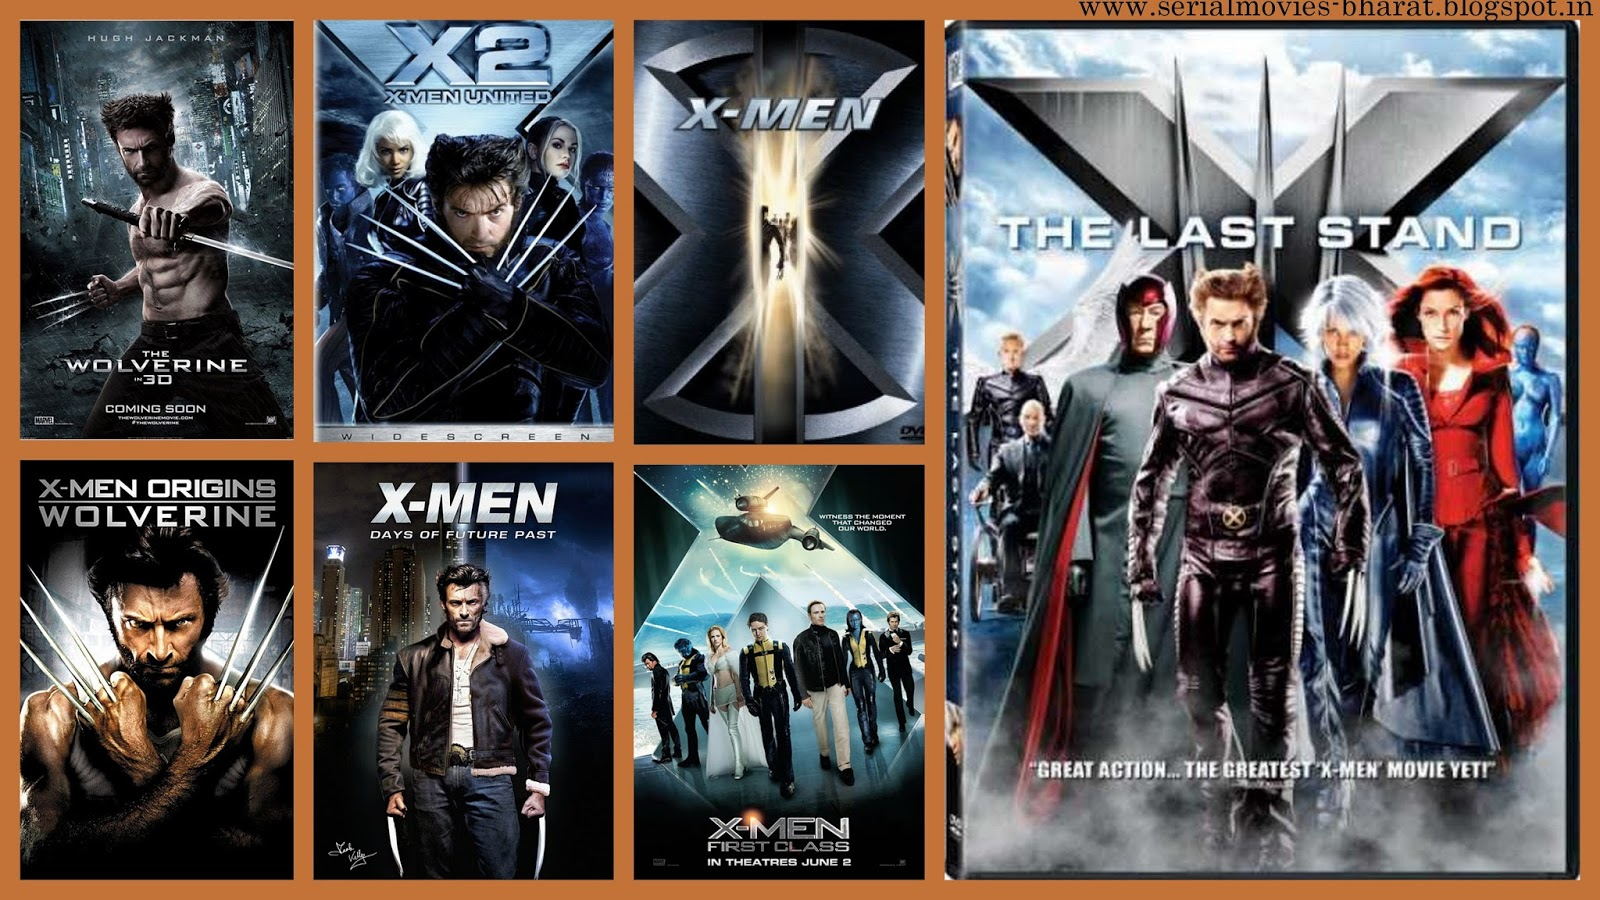 movies series: x-men movies series